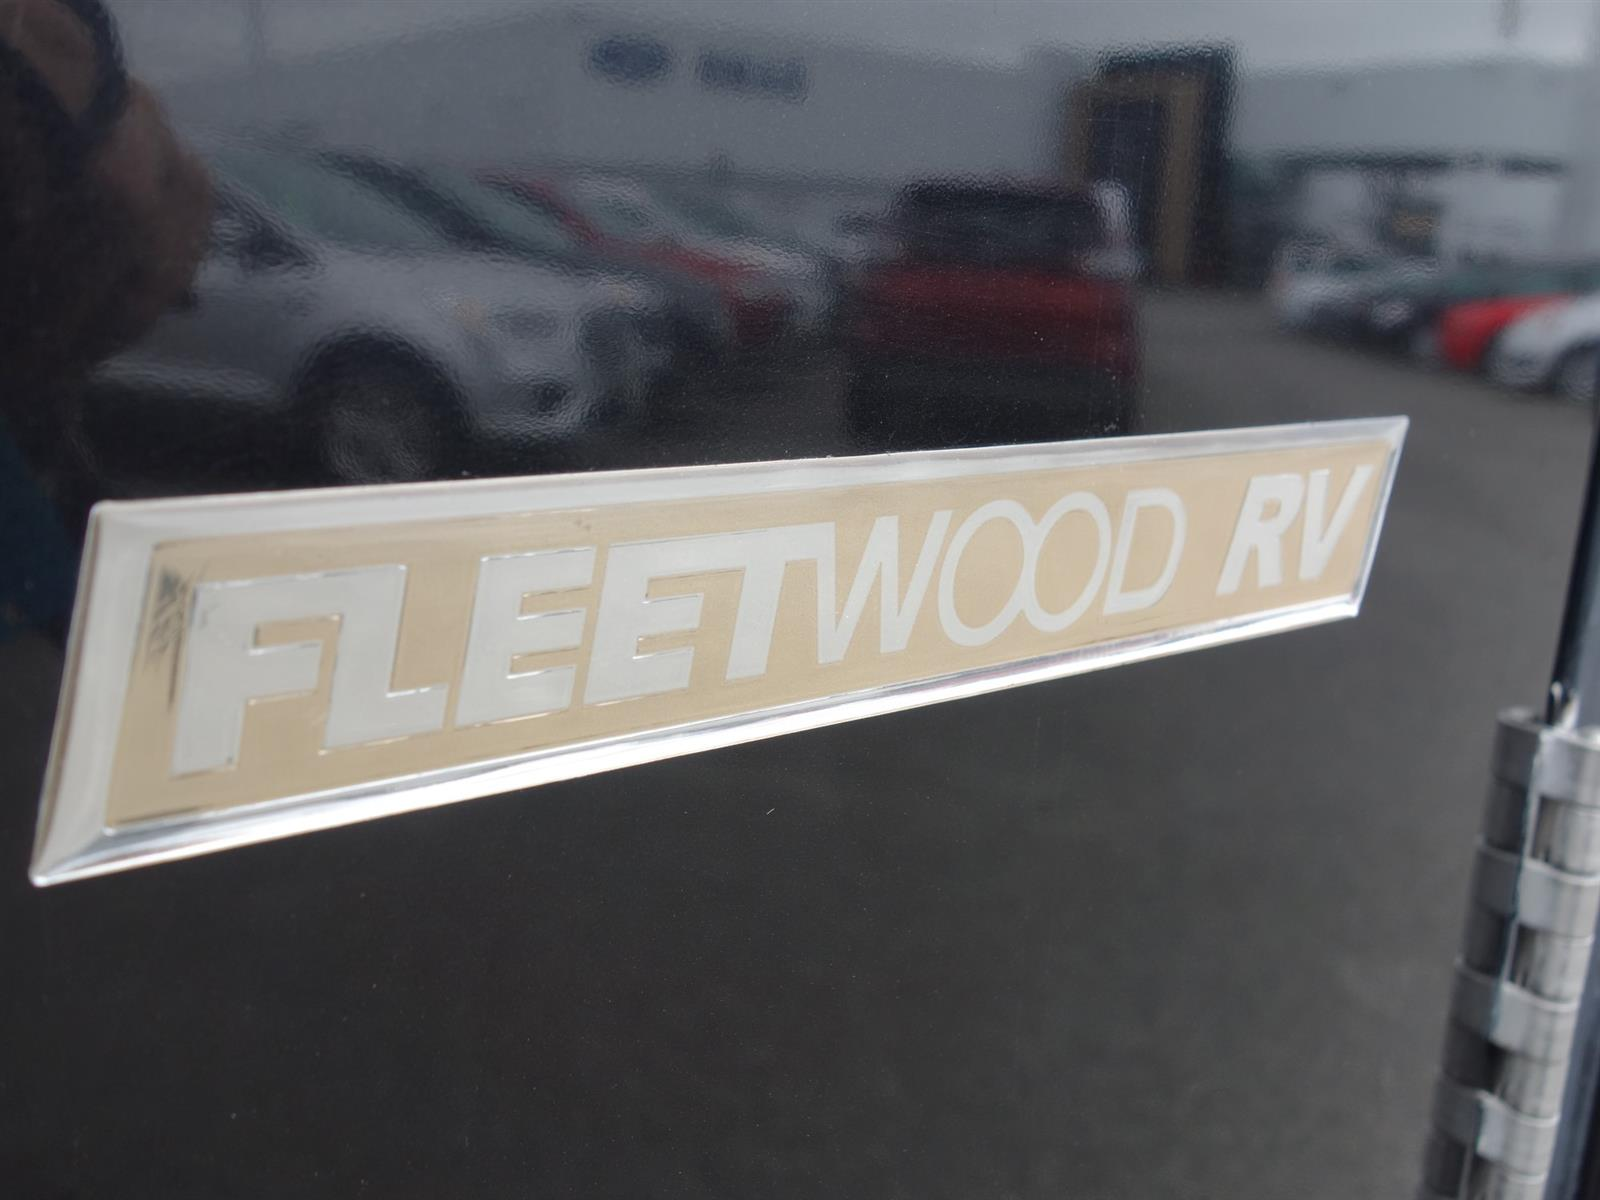 2004 Fleetwood REVOLUTION MOTORHOME